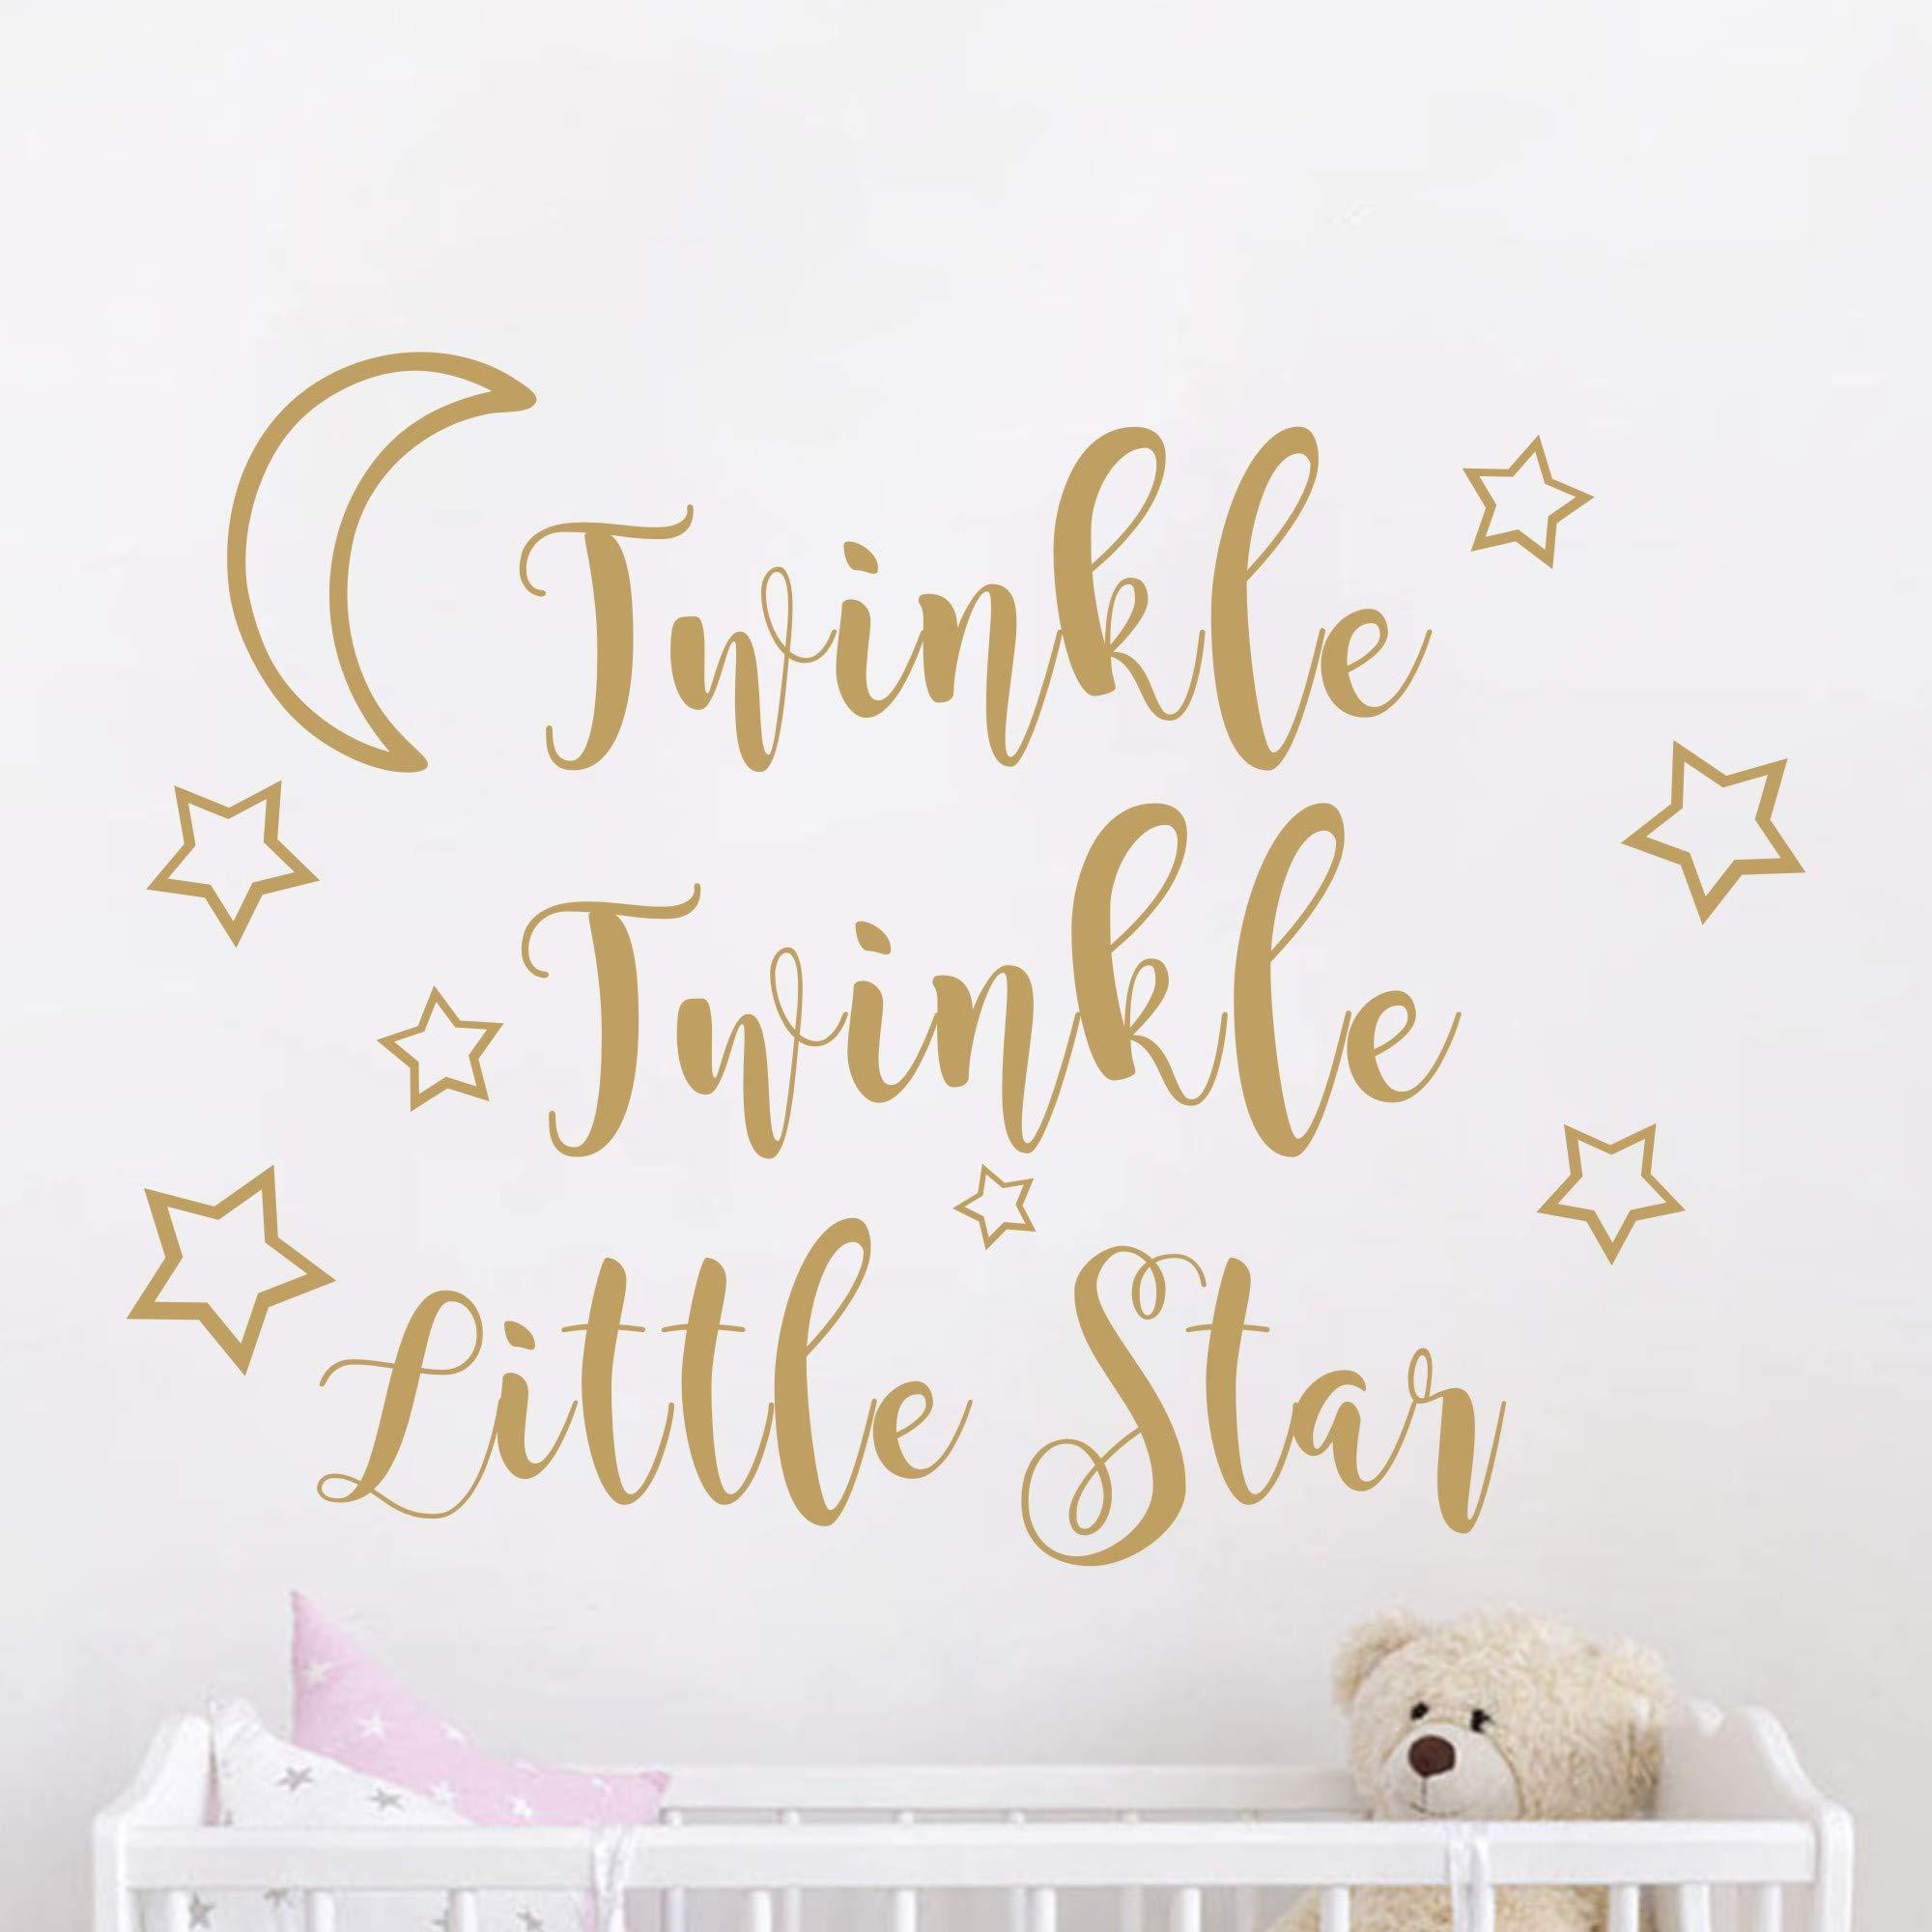 JOYRESIDE Twinkle Twinkle Little Star Wall Decal Art Vinyl Sticker for Kids Baby Boy Girl's Room Decoration Nursery Bedroom Home Decor YMX29 (Matte Gold, 57x42cm)